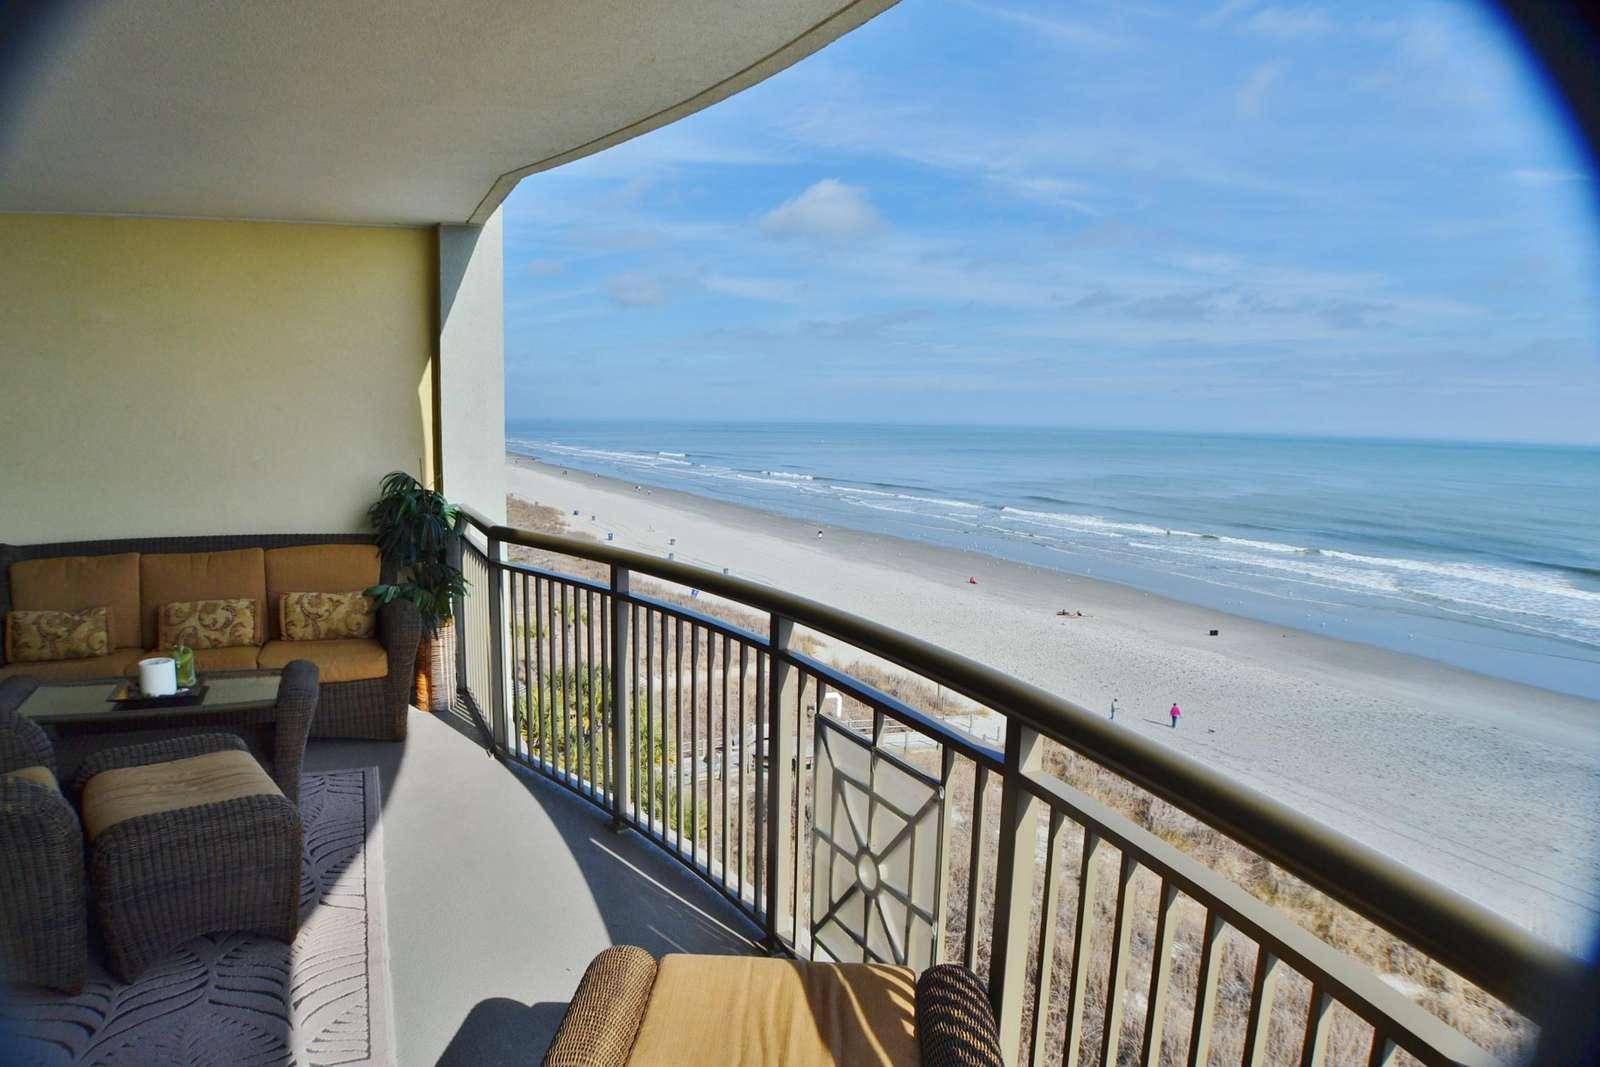 Oversize balcony with upgraded furnishings